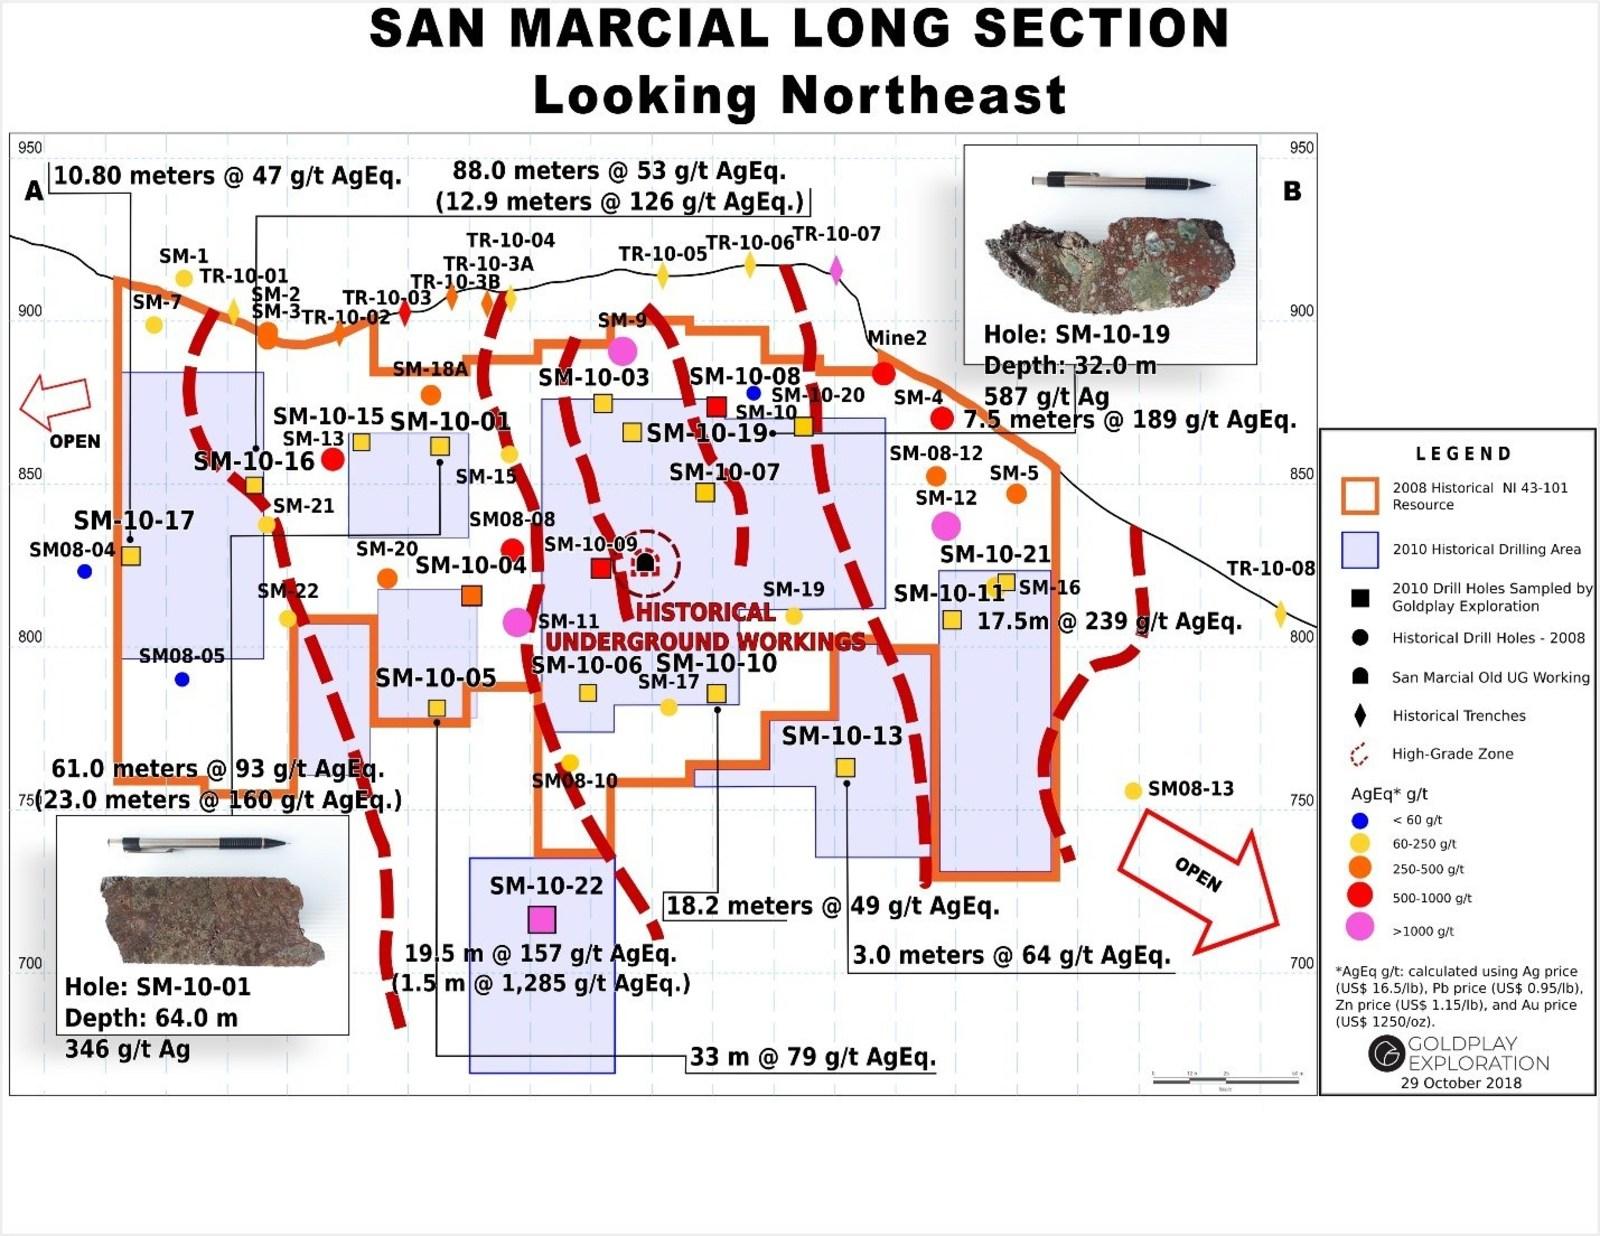 Figure 7: San Marcial Longitudinal Section A-B